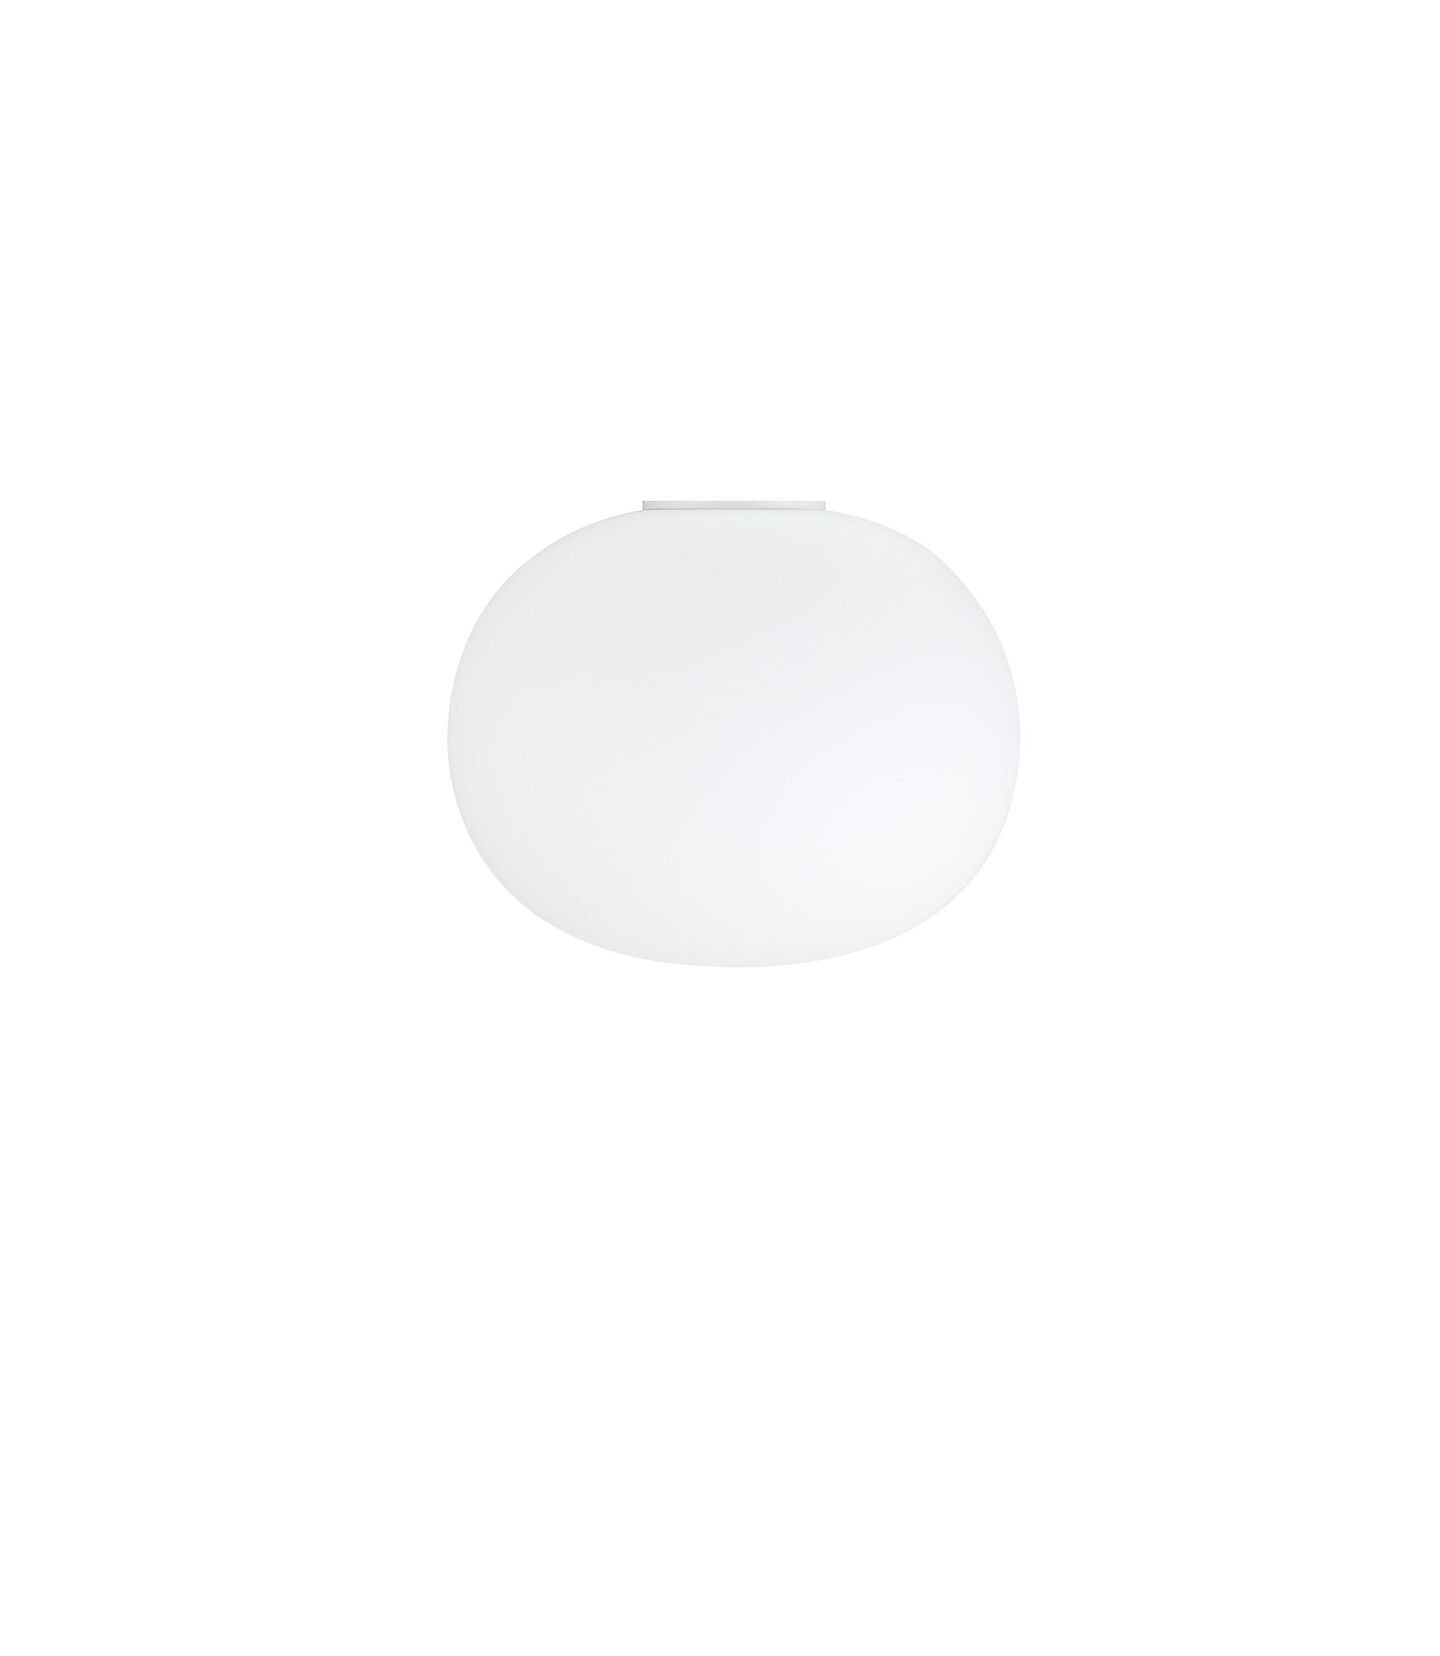 glo-ball-ceiling-wall-2-morrison-flos-F3028000-product-still-life-big-1